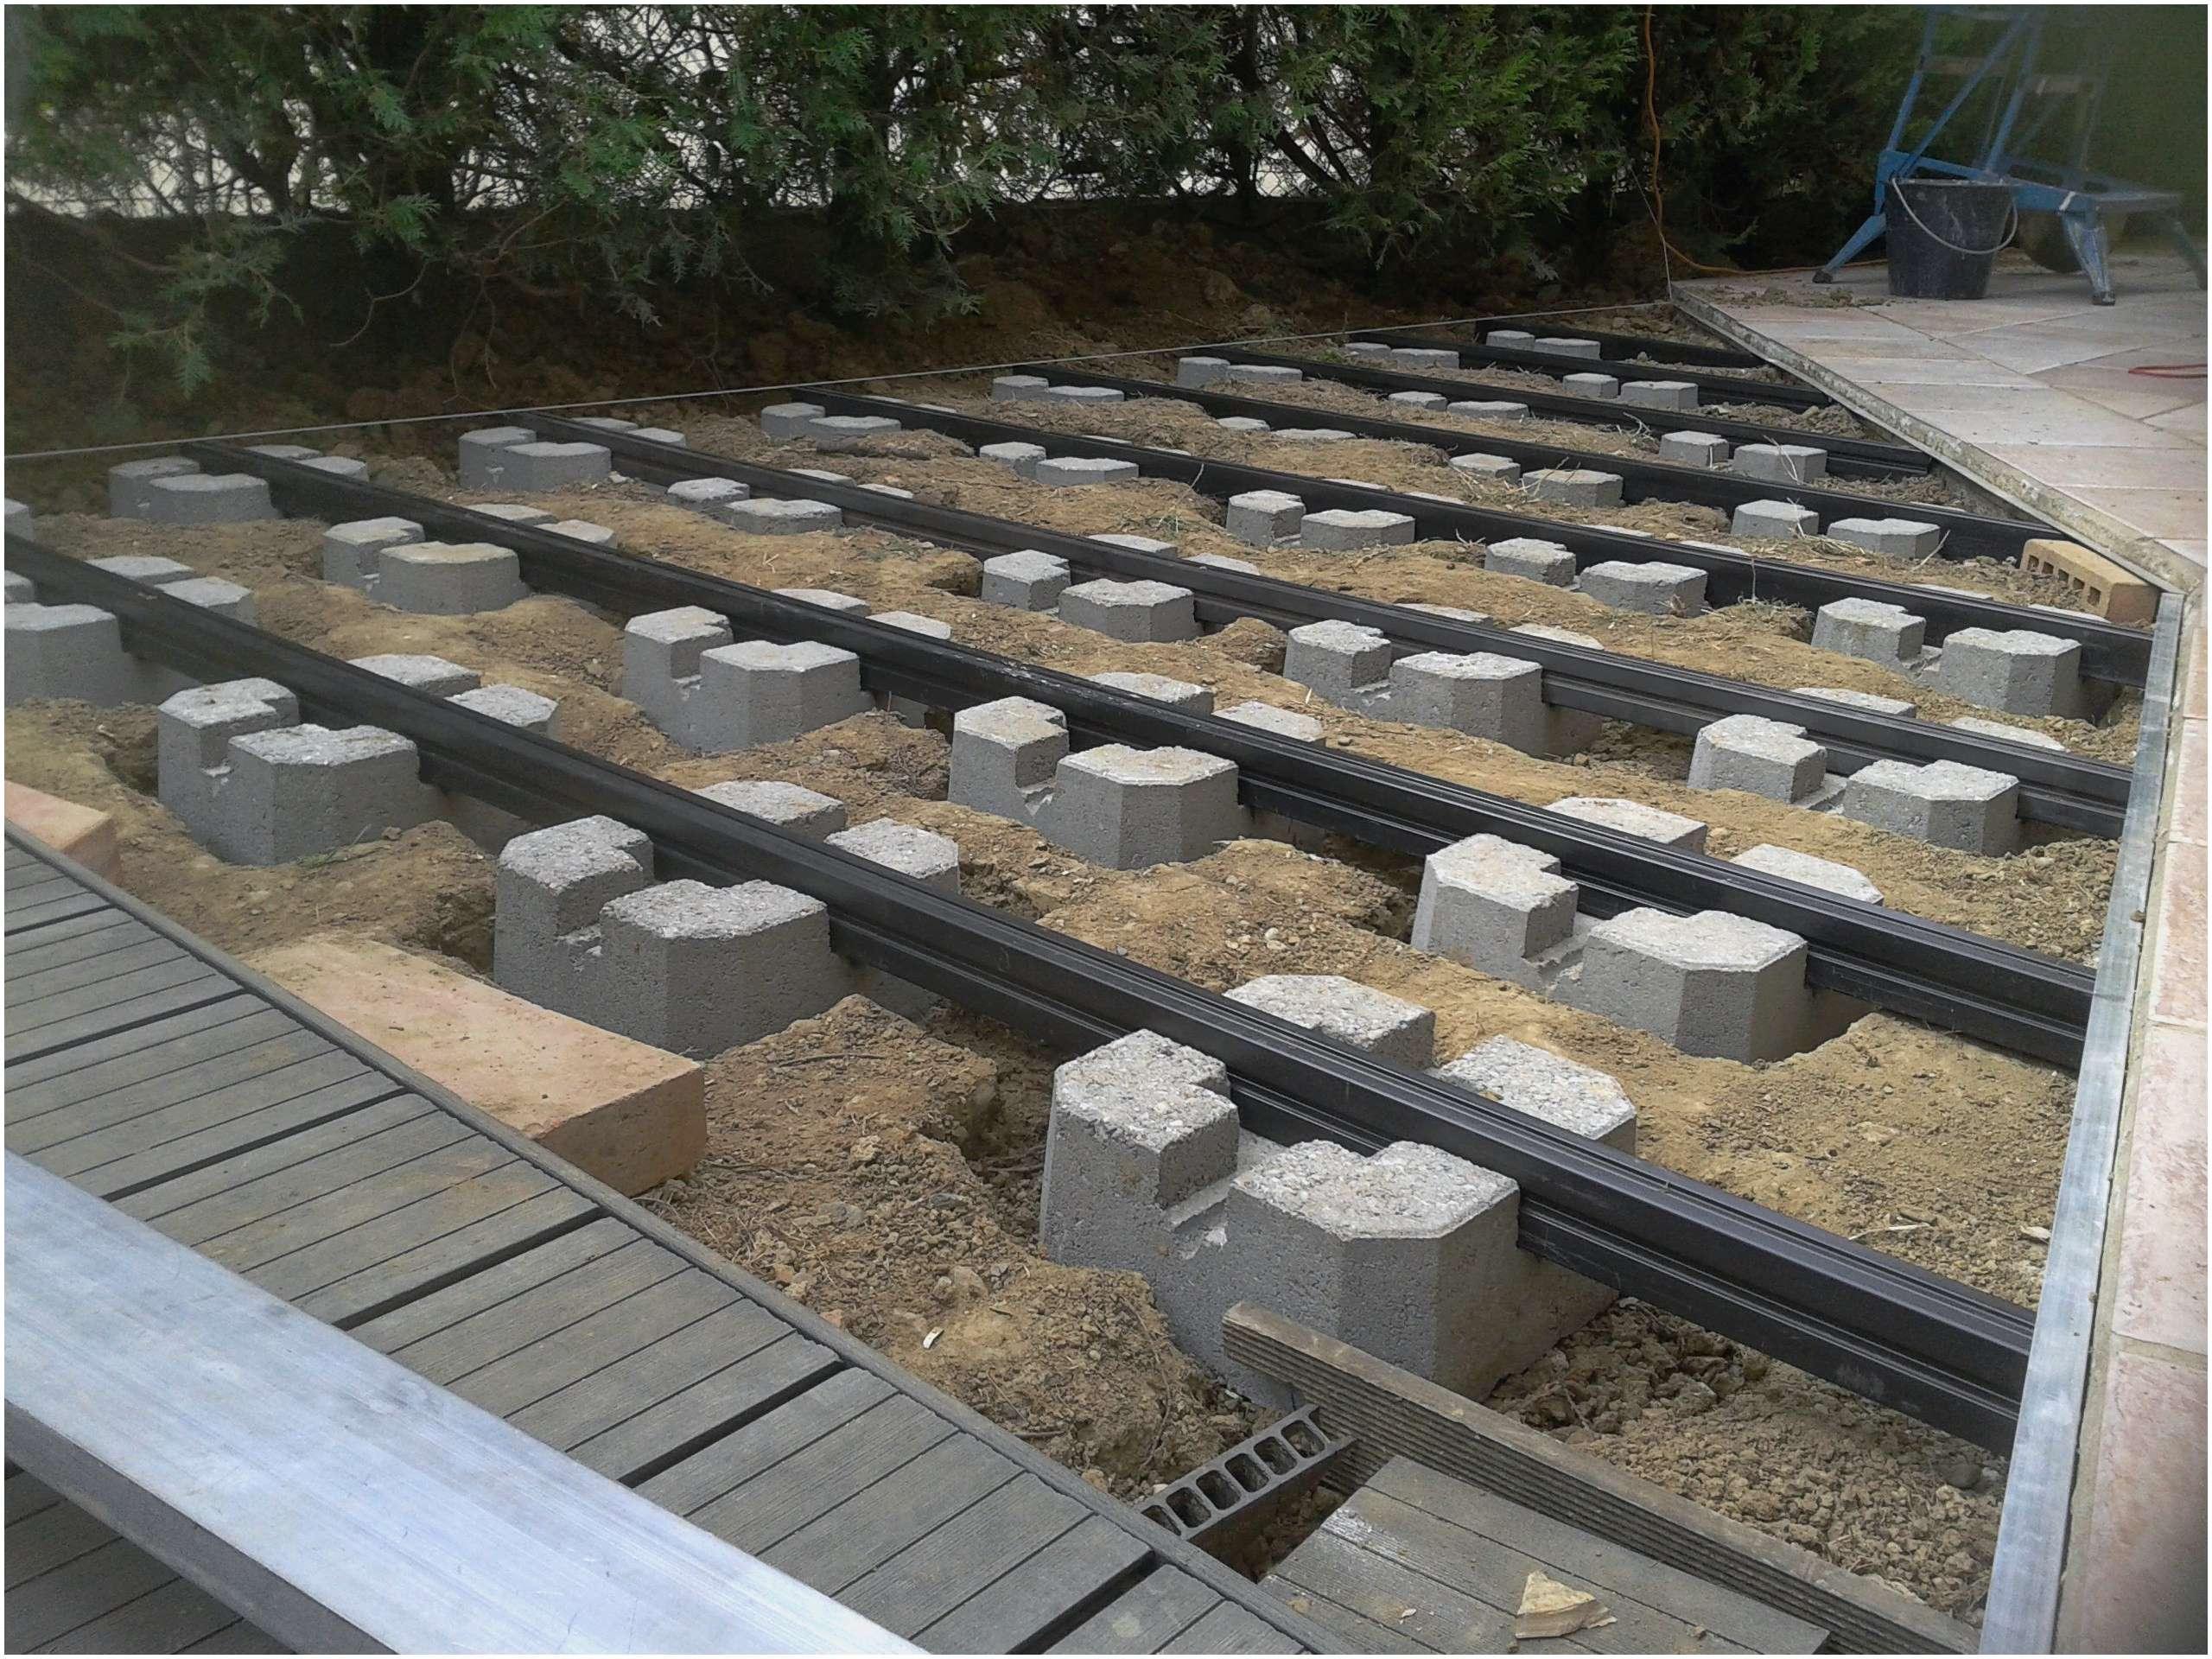 Lambourde Bois Brico Depot – Gamboahinestrosa concernant Plot Reglable Terrasse Brico Depot